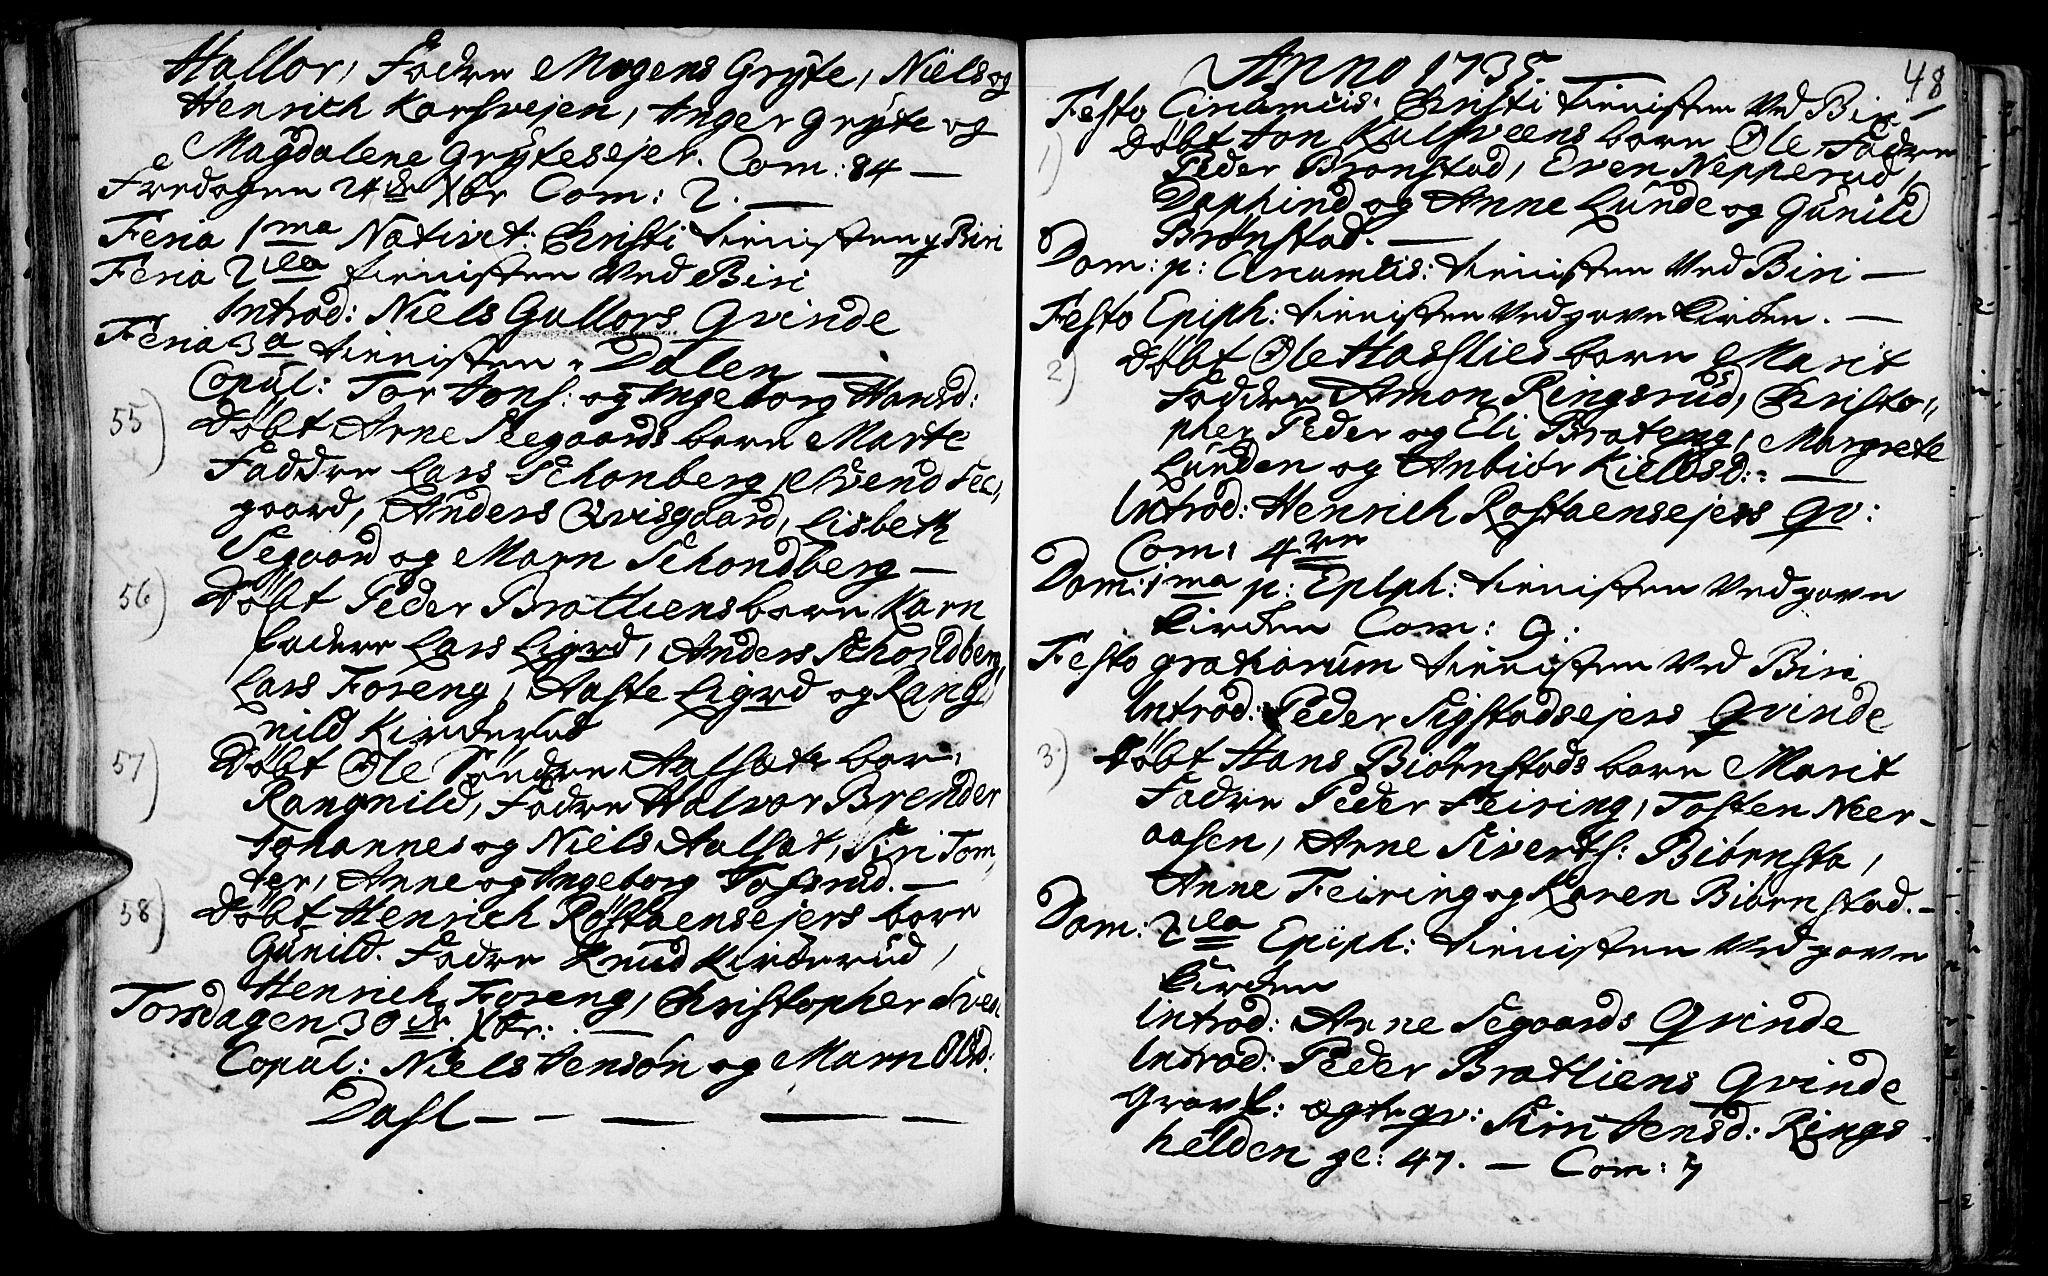 SAH, Biri prestekontor, Ministerialbok nr. 1, 1730-1754, s. 48